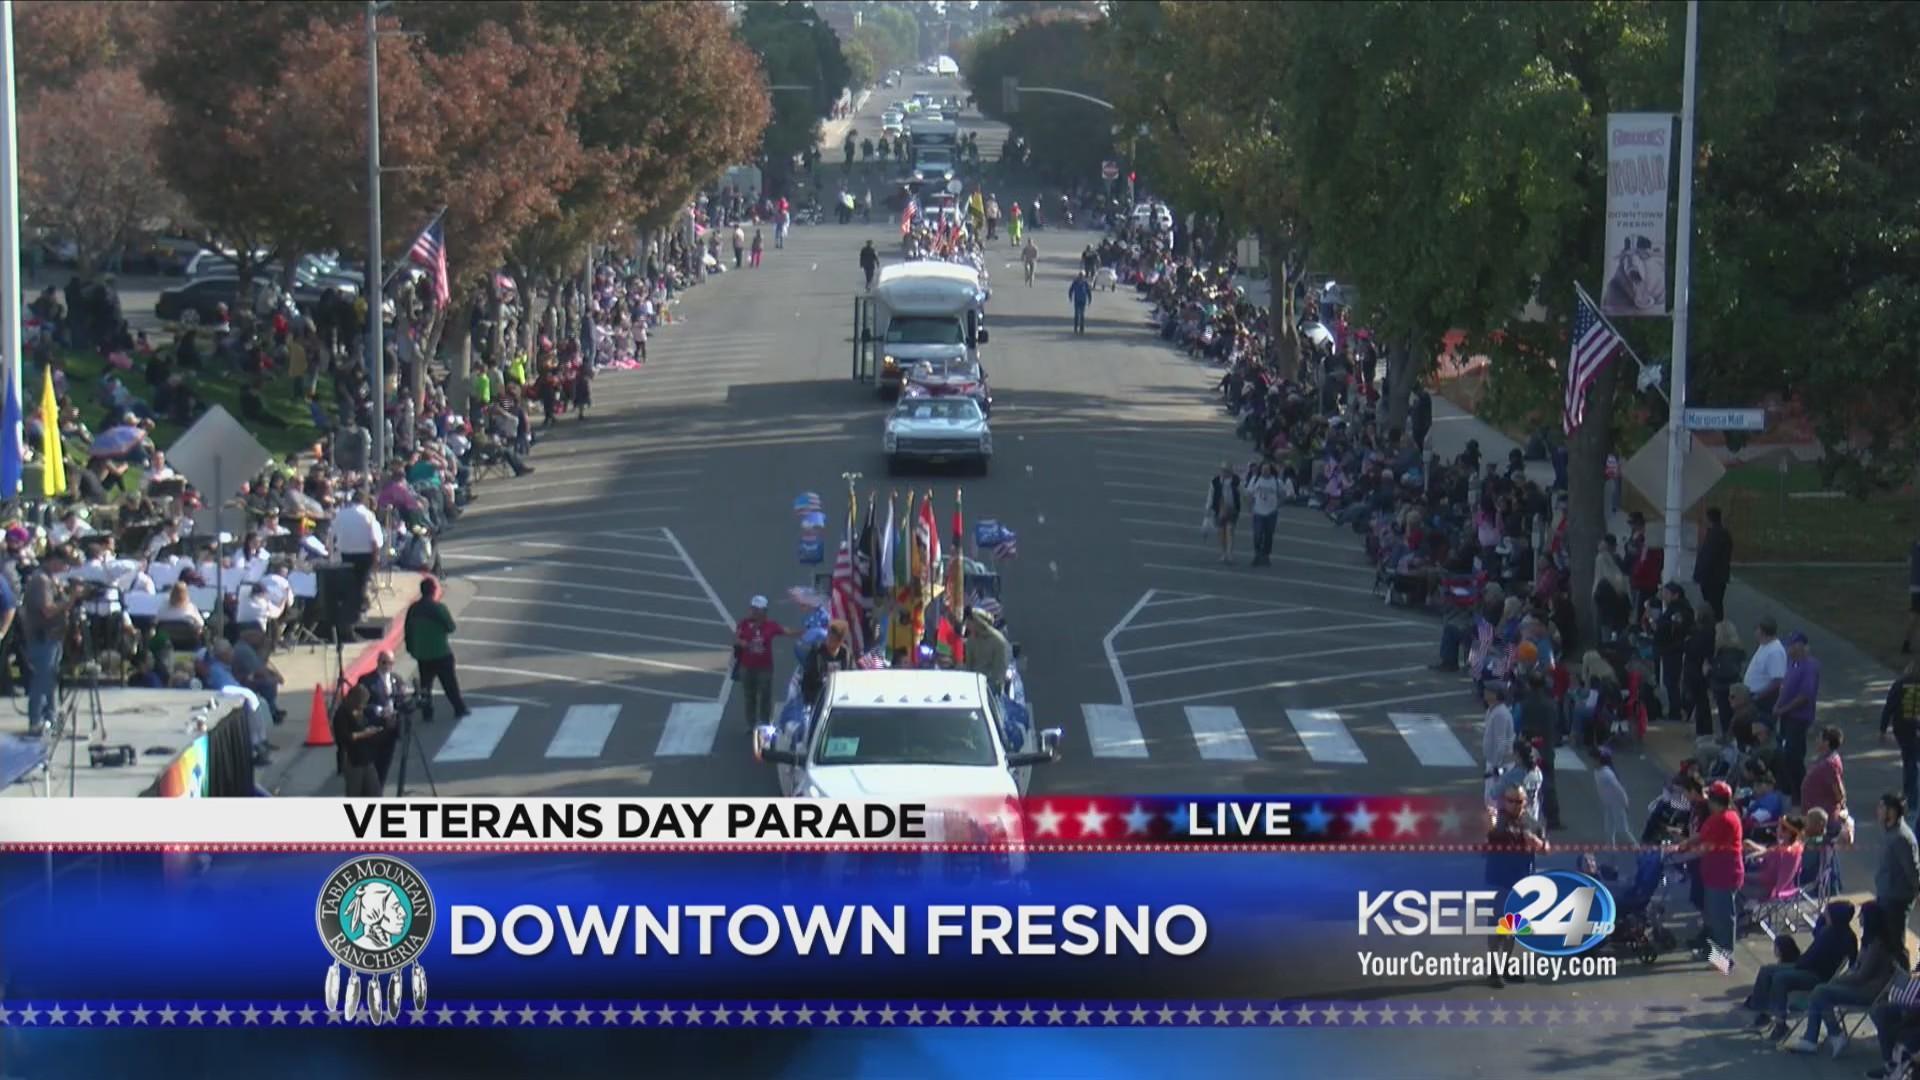 Fresno Veterans Day Parade 2018 - Part 1